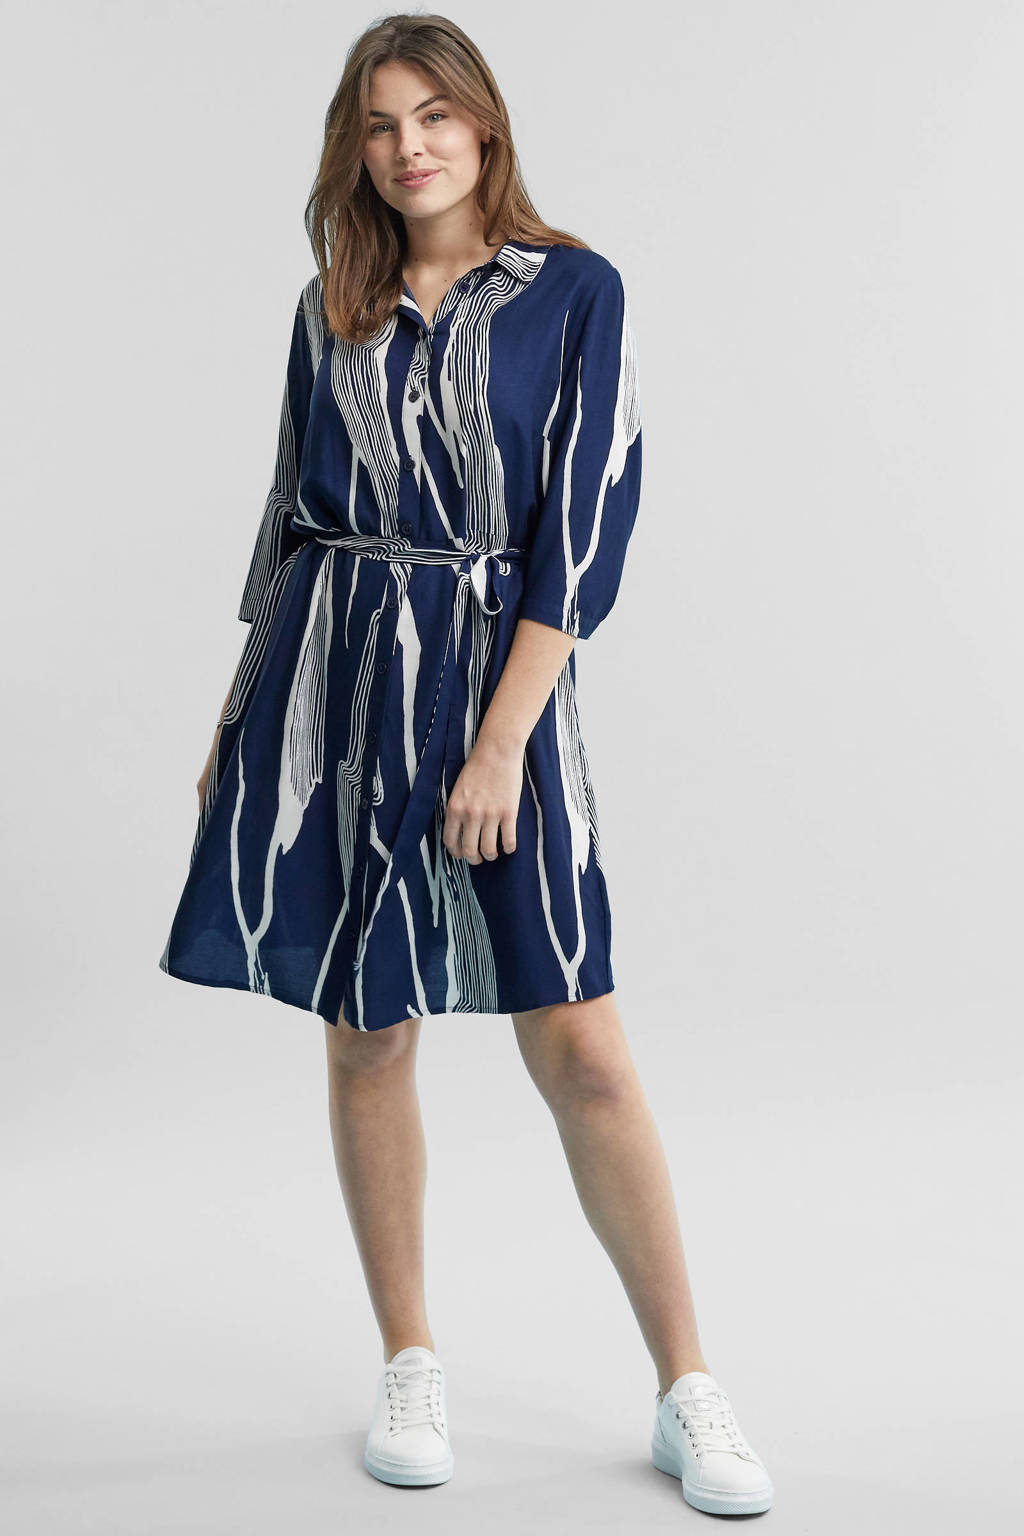 GREAT LOOKS blousejurk blauw, Blauw/wit